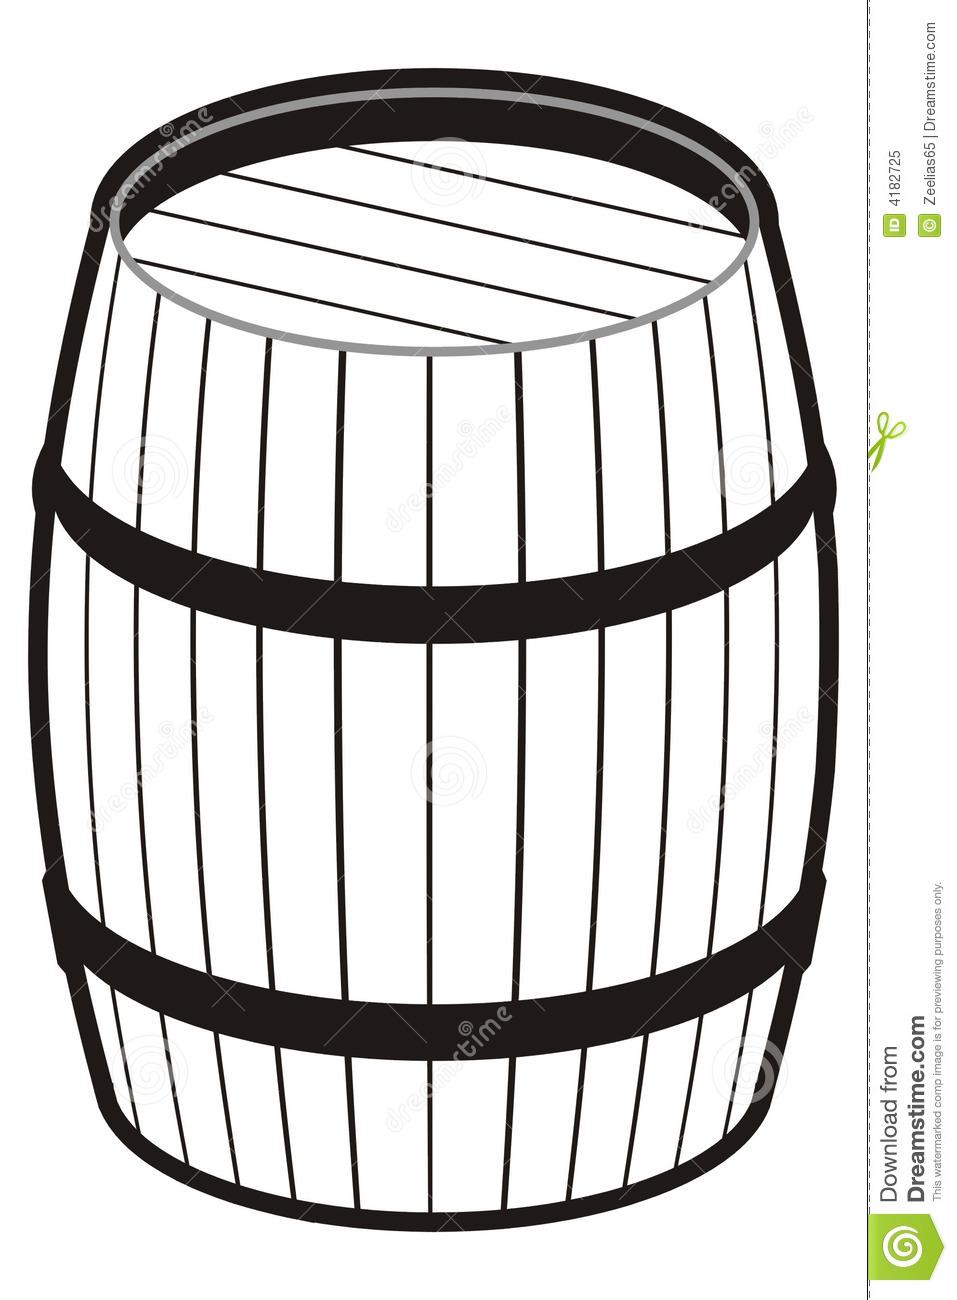 Barrel clipart black and white #8